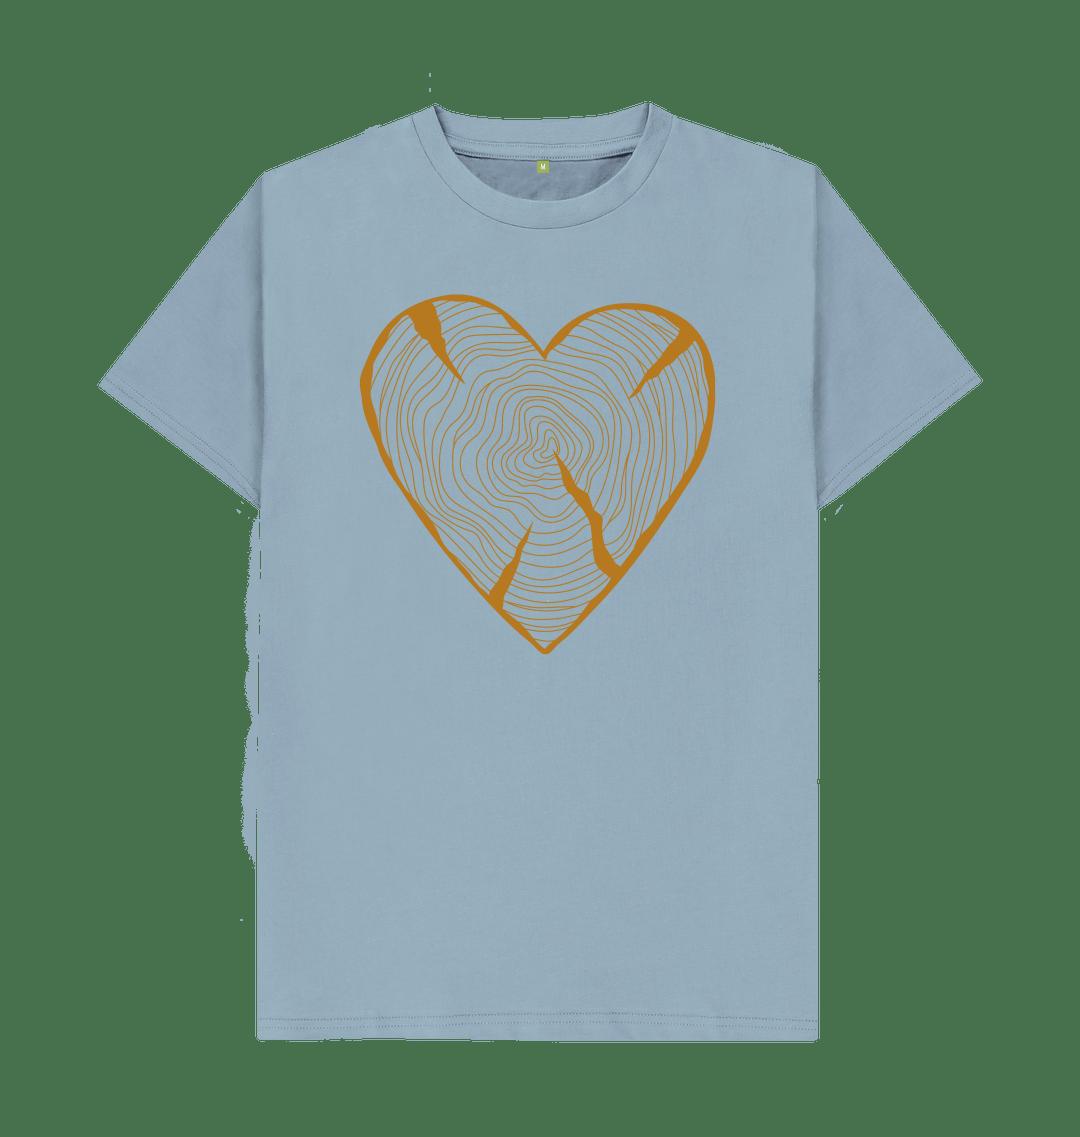 Unisex NATURE HEART ADVENTURE Organic Cotton T-shirt light blue